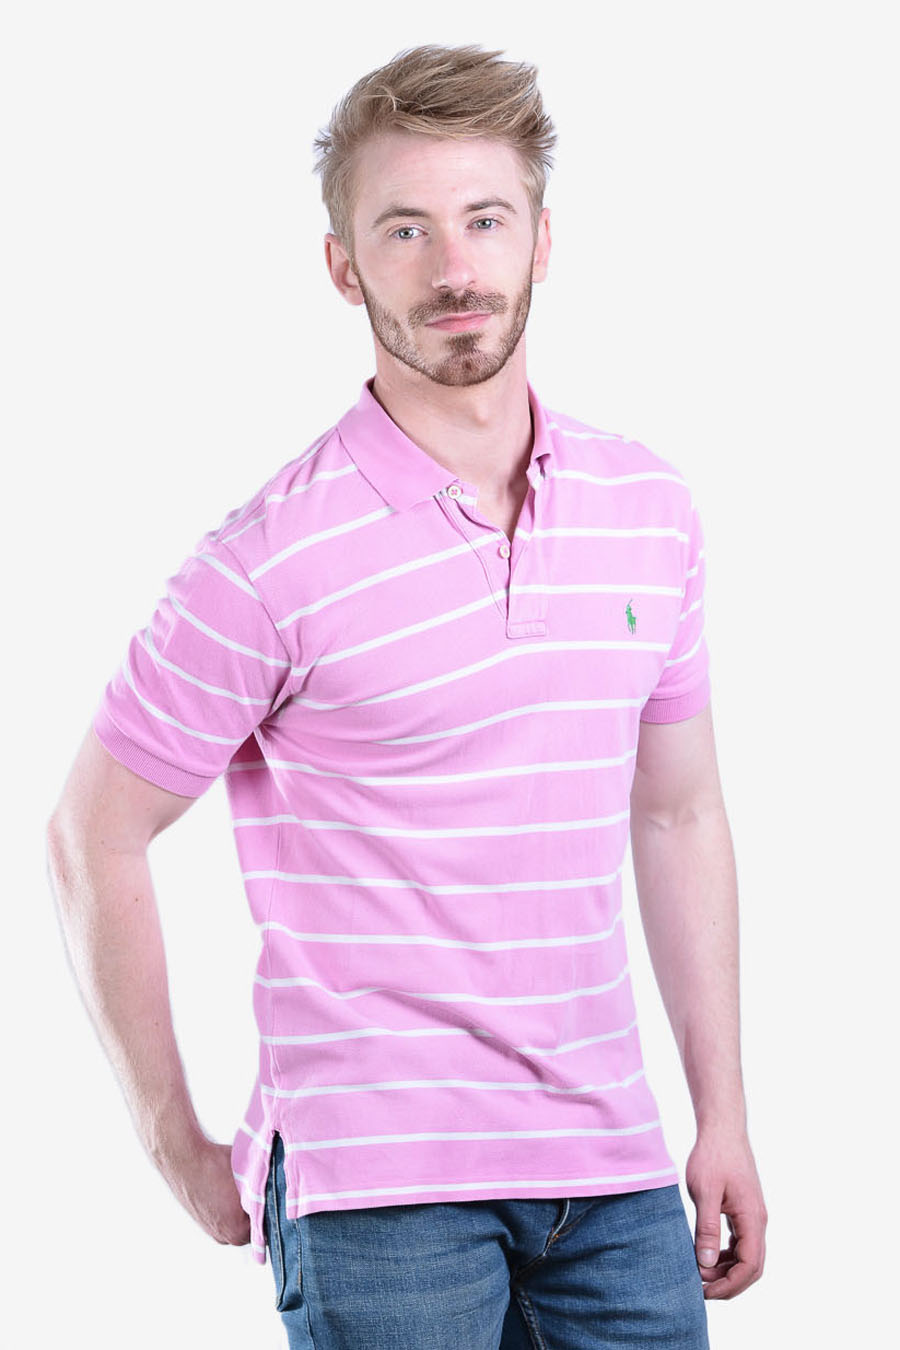 Vintage men's Ralph Lauren polo shirt